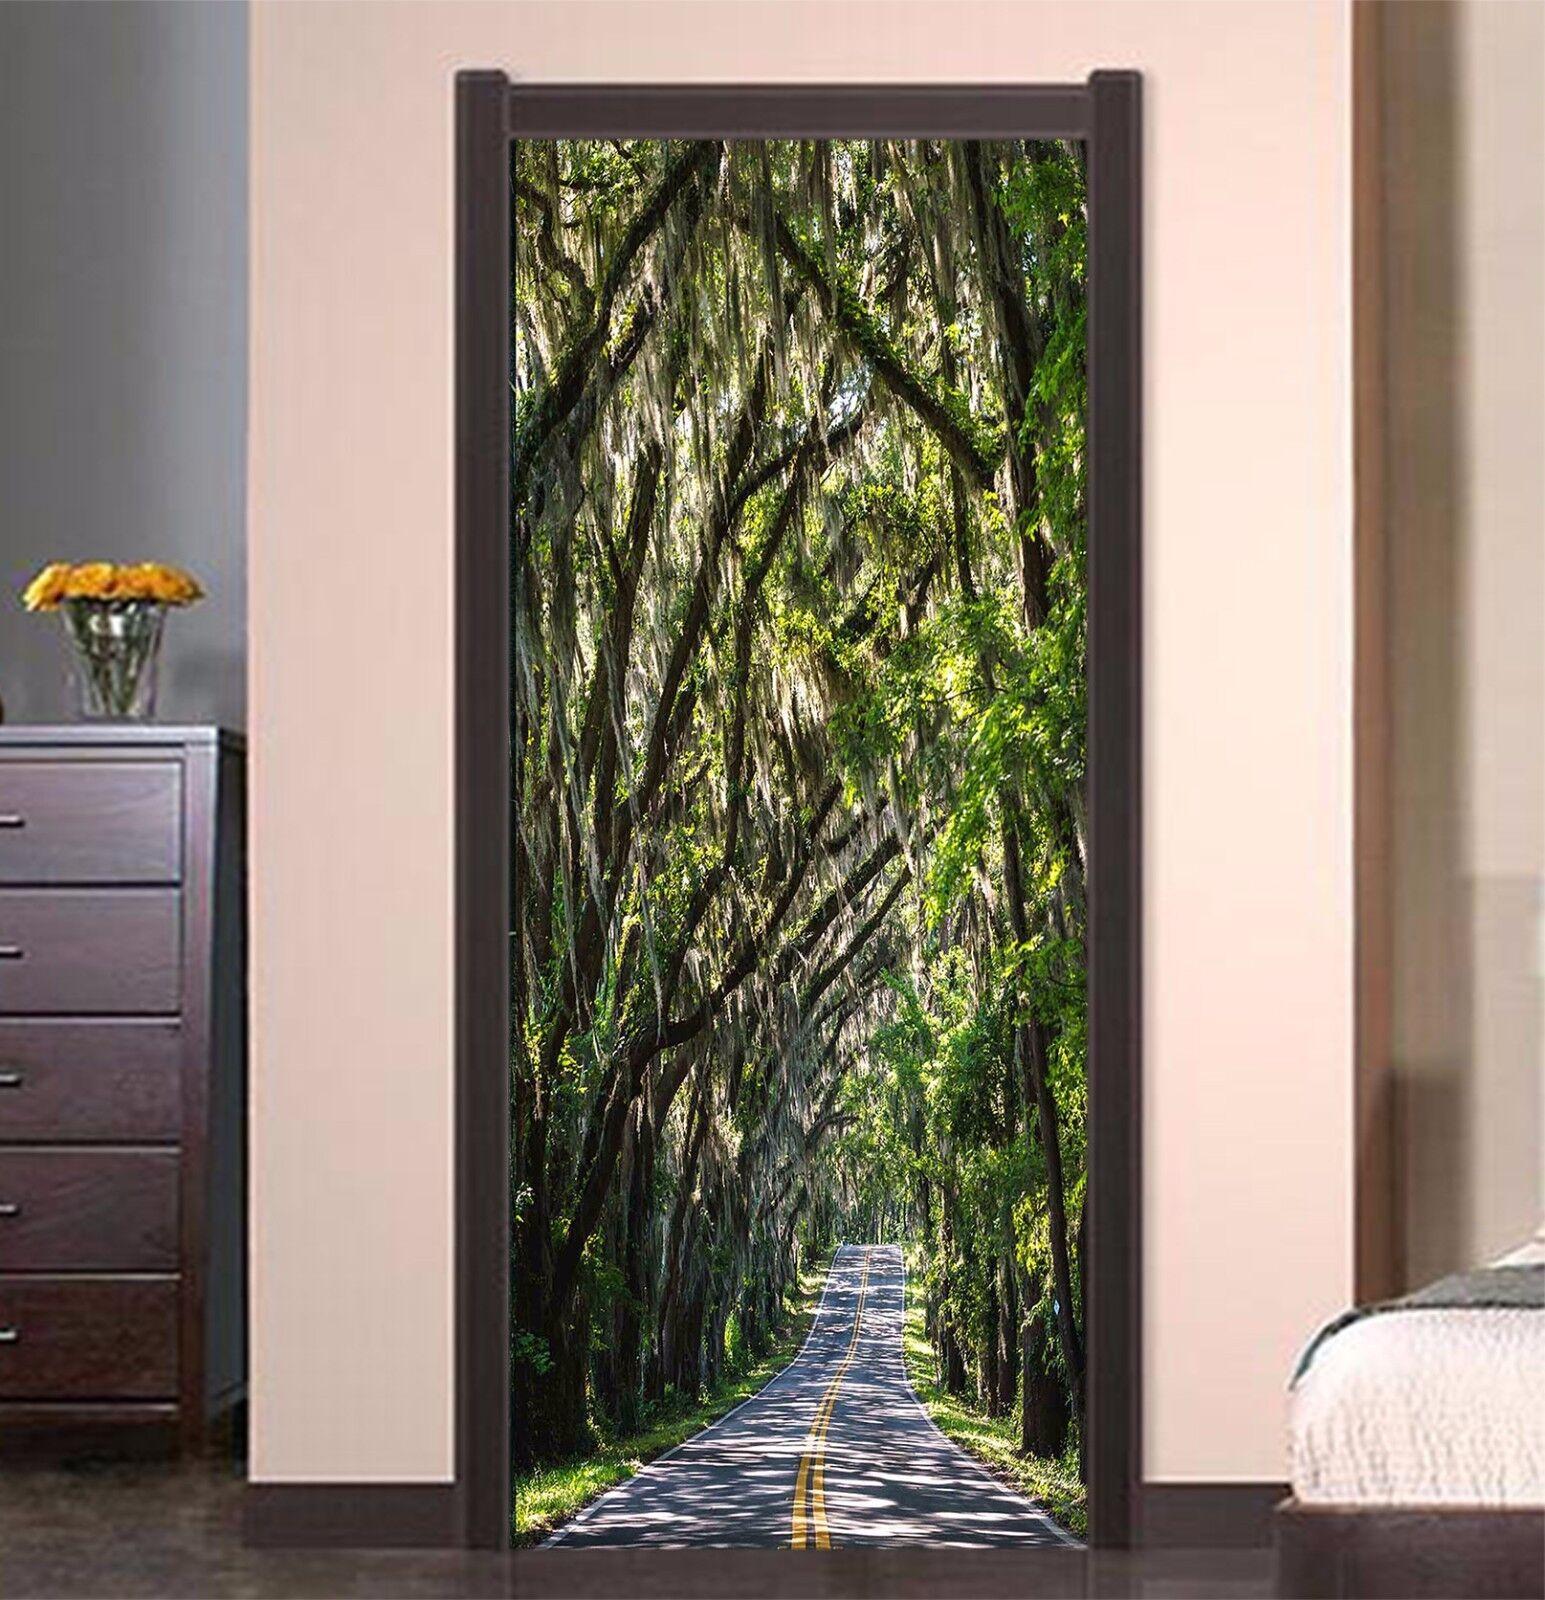 3D Zweige 779 Tür Wandmalerei Wandaufkleber Aufkleber AJ WALLPAPER DE Kyra